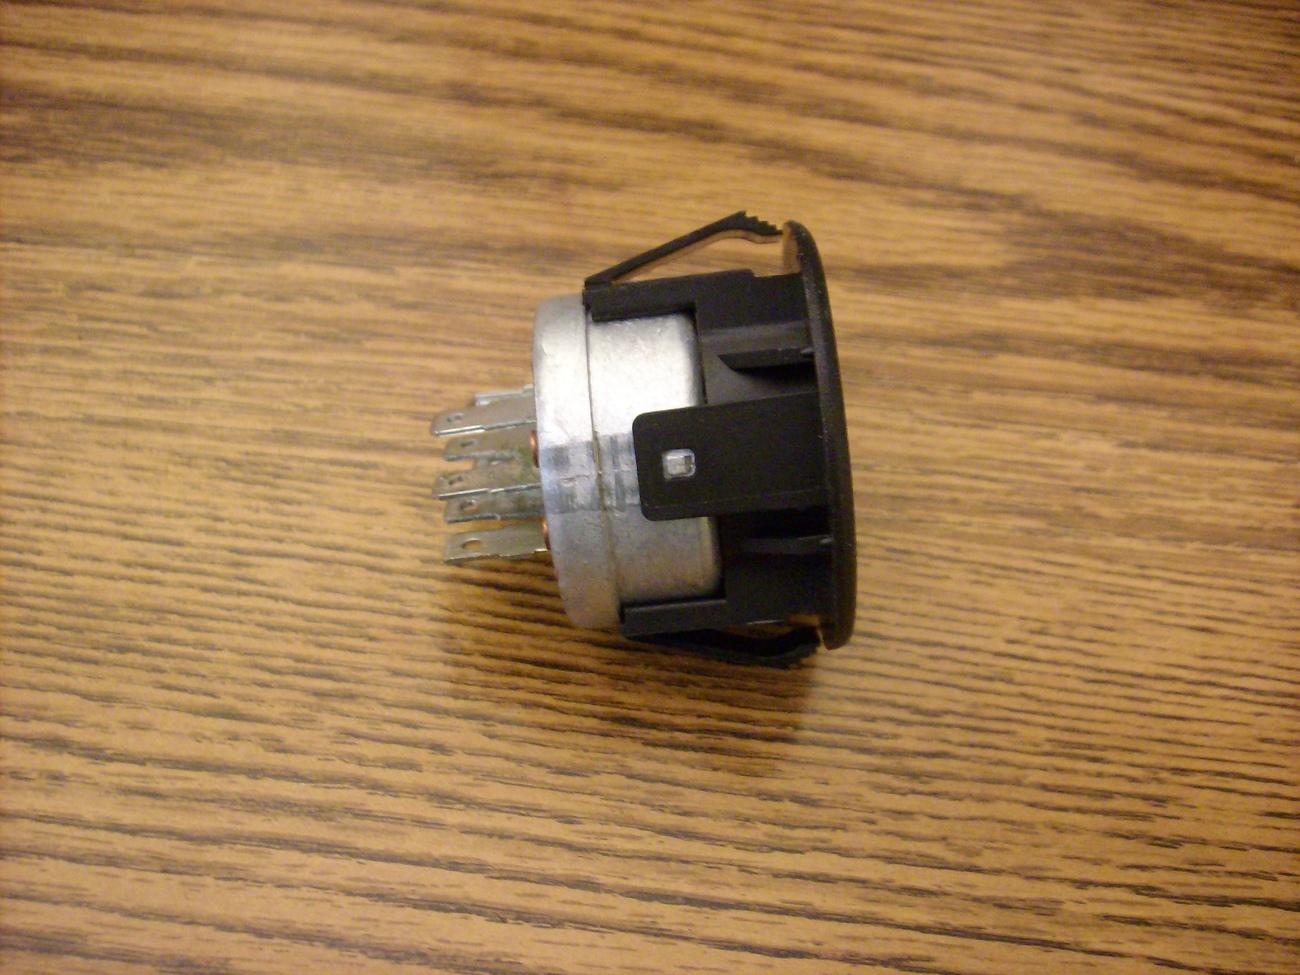 Ignition starter switch Ariens mini zoom 1640, 1844, 2048, 2252, 15883, 01588300